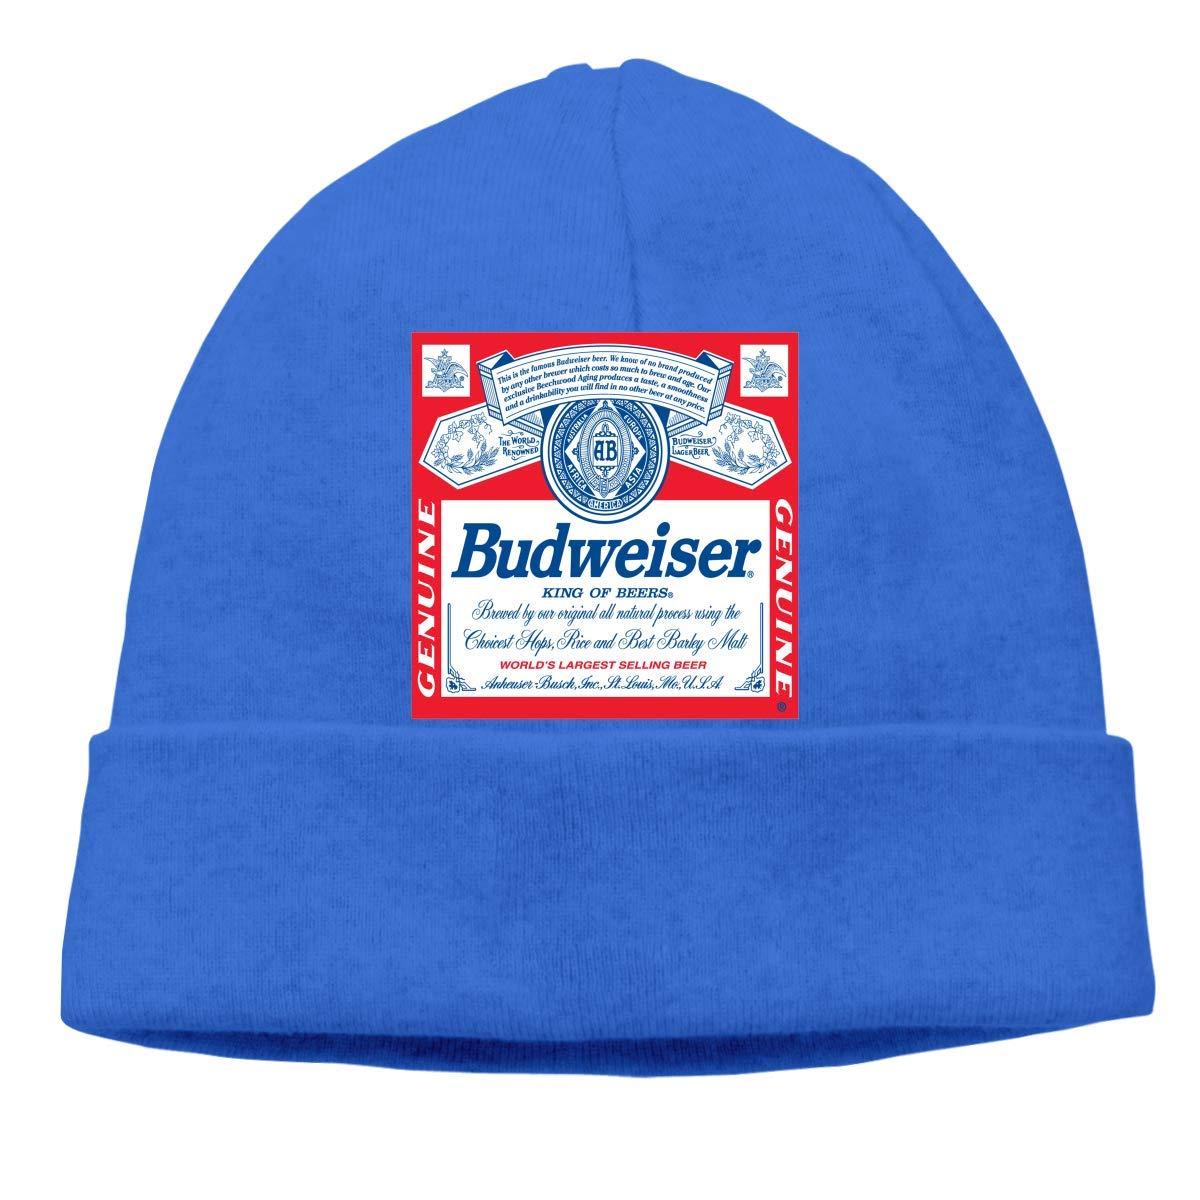 ARTOPB Fashion Funny 2019 Warm Winter Beanie Mens Womens Budweiser King of Beer Beanie Hats Winter Outdoor Fashion Slouchy Warm Skull Caps